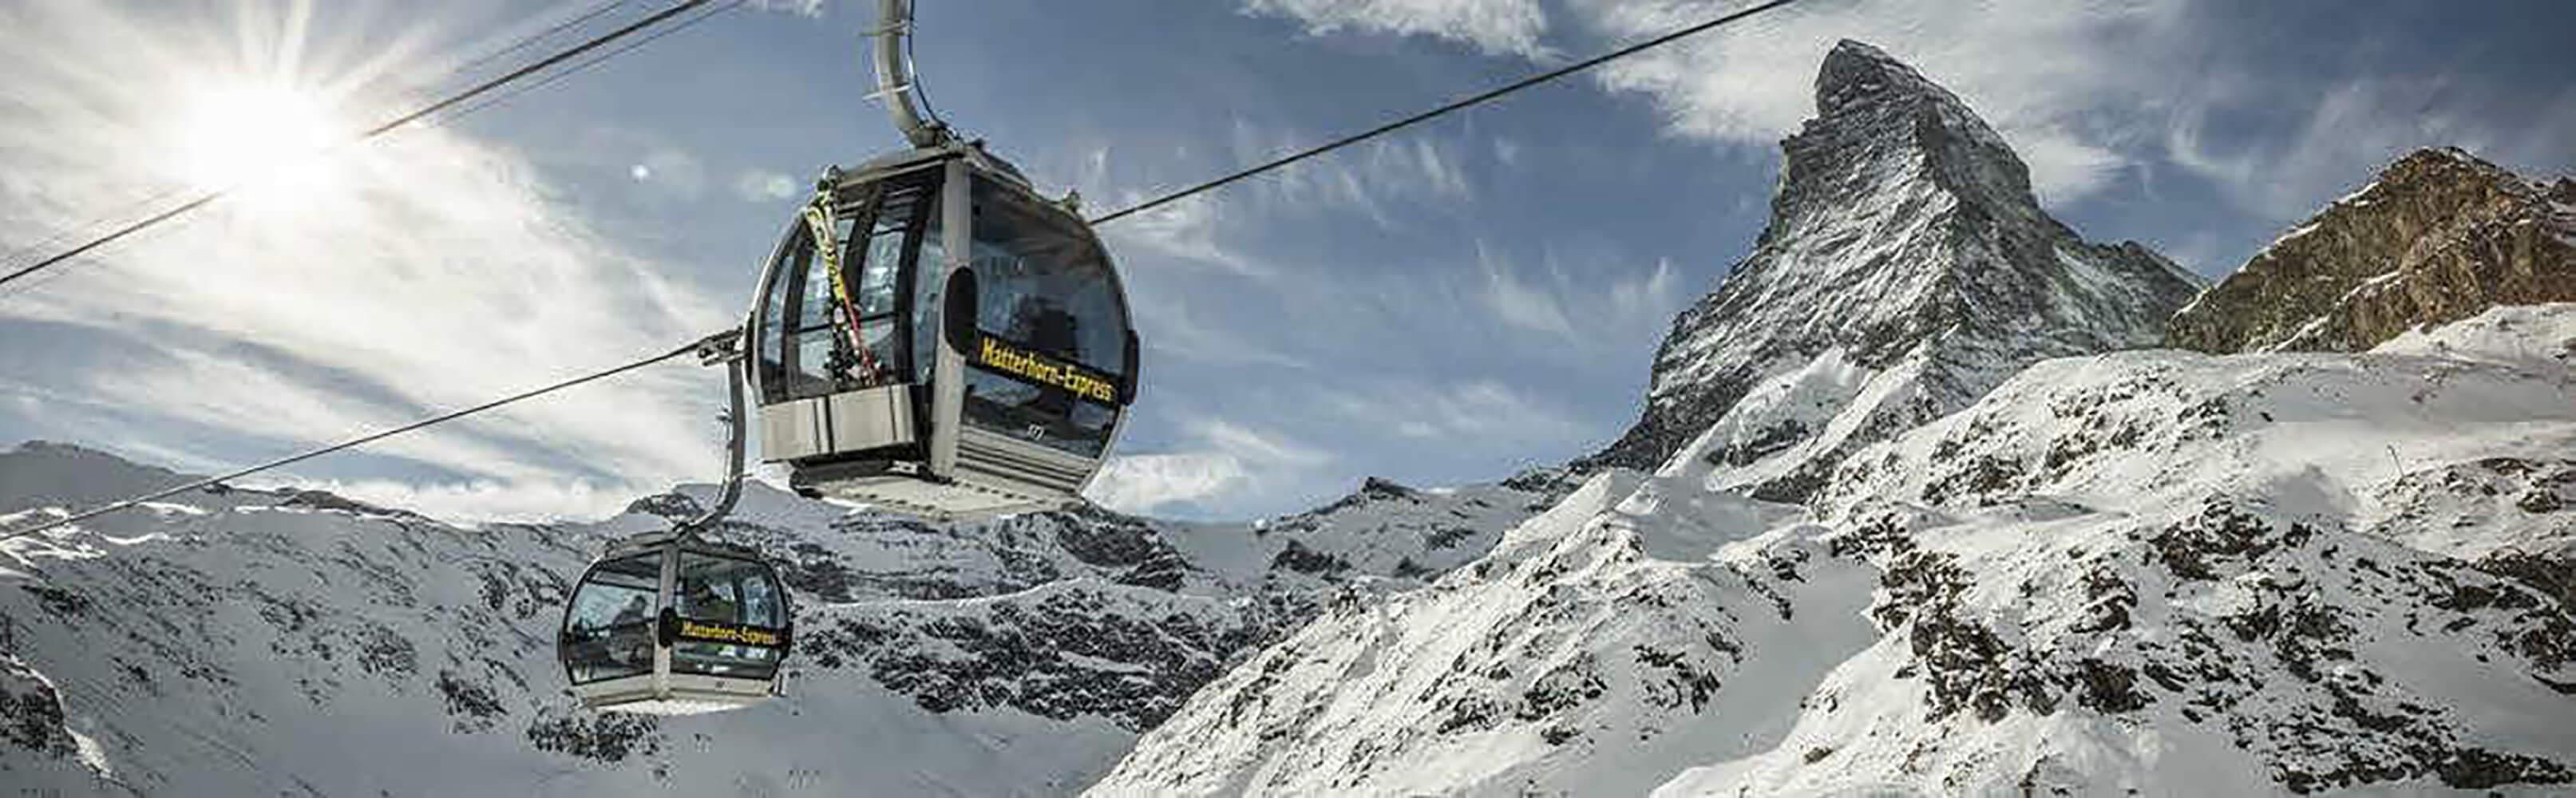 Zermatt – Matterhorn ski paradise 1